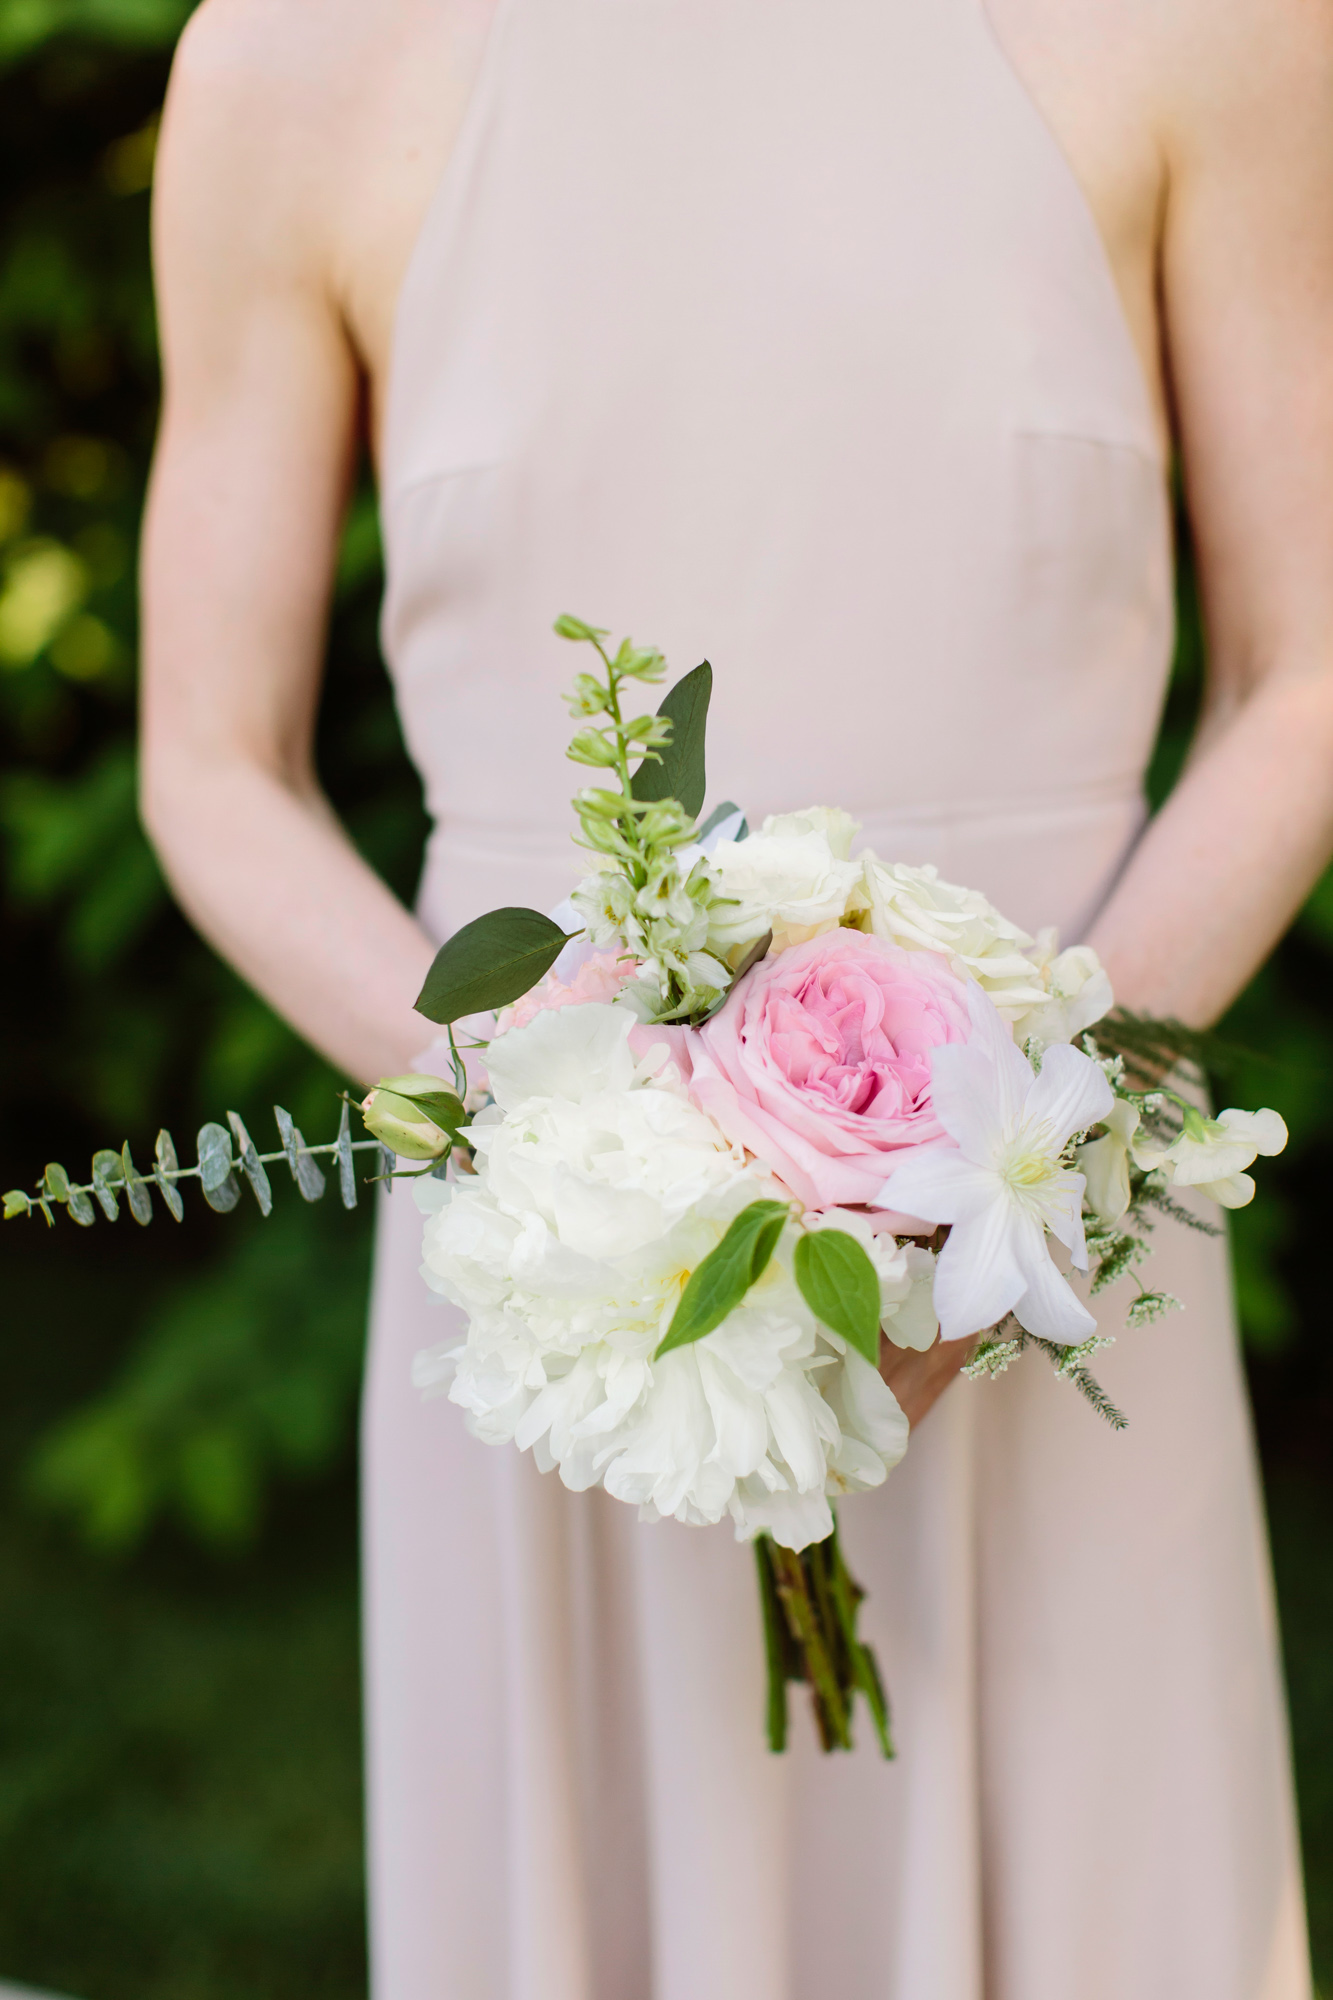 40_Rowan_Brian_The_Roundhouse_Wedding_Beacon_NY_Tanya_Salazar_Photography_1068.jpg